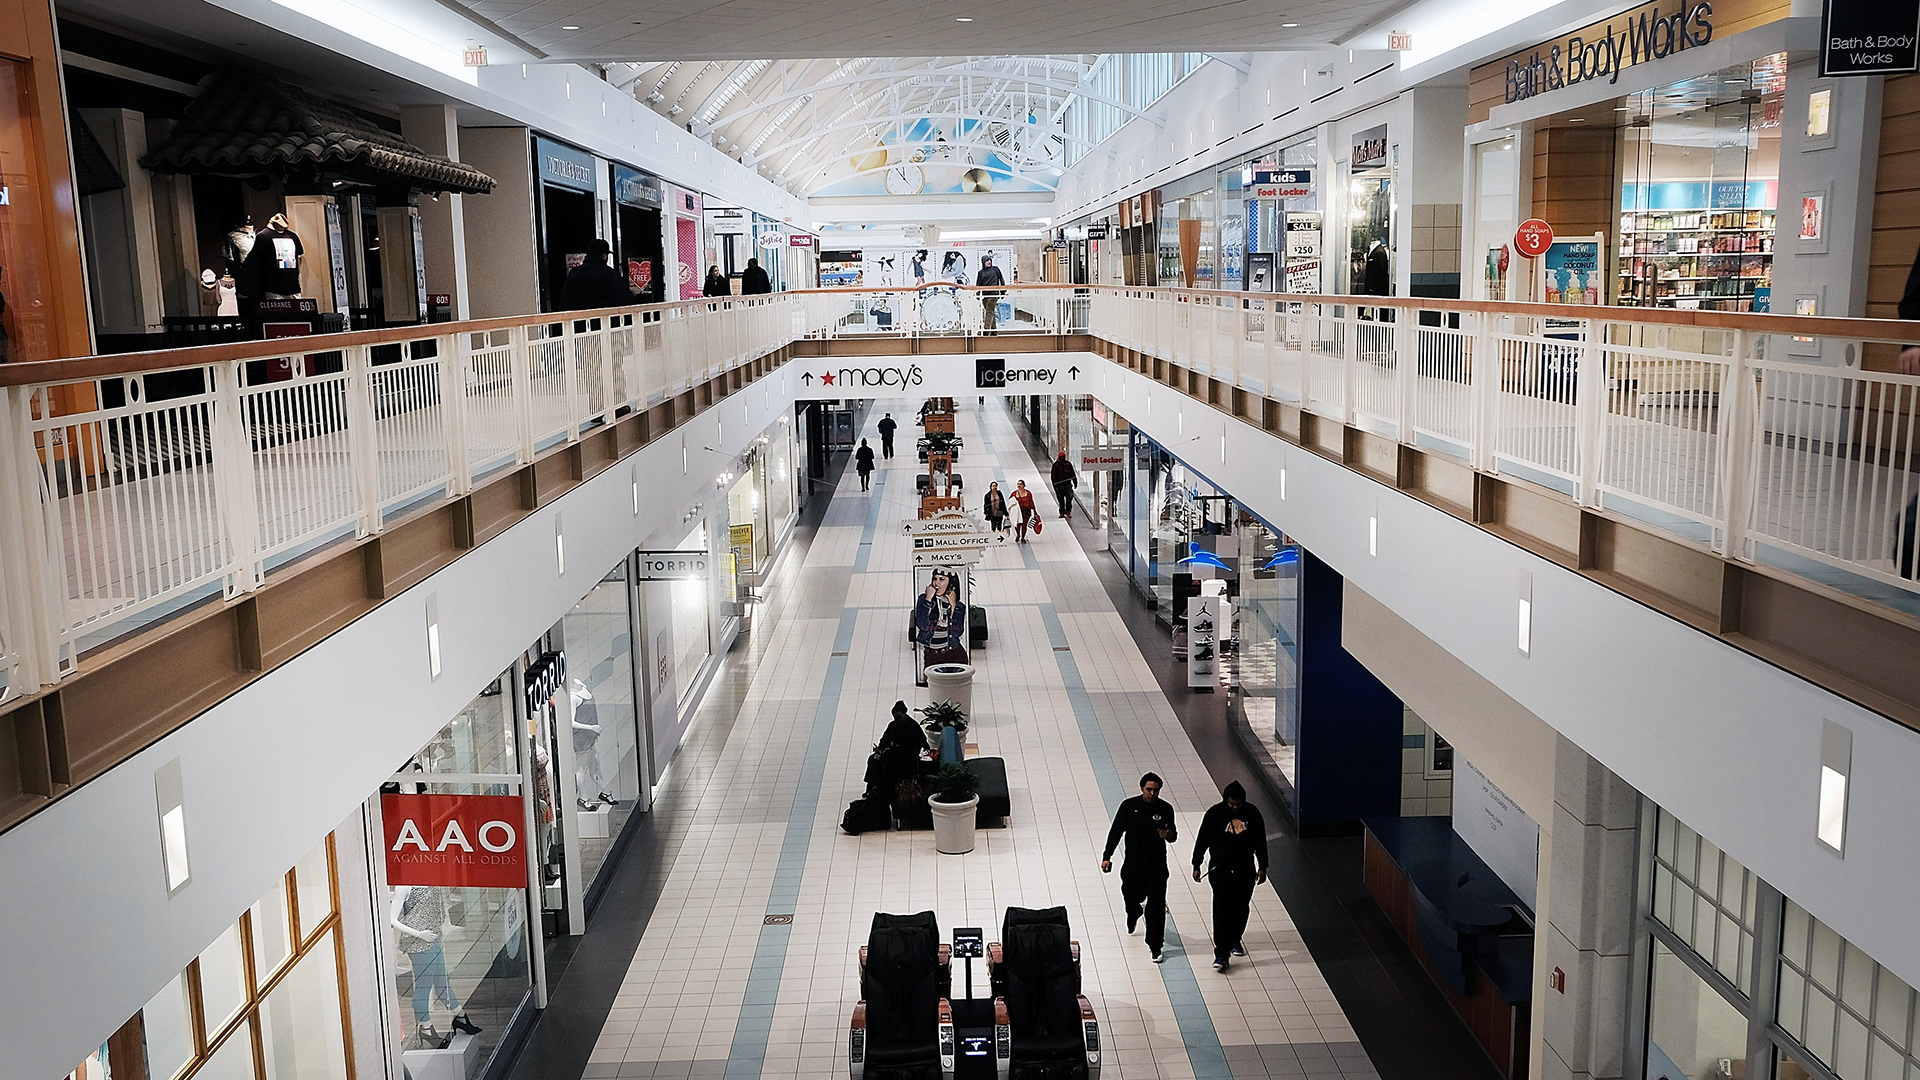 Interior of a shopping mall-159532.jpg31034428